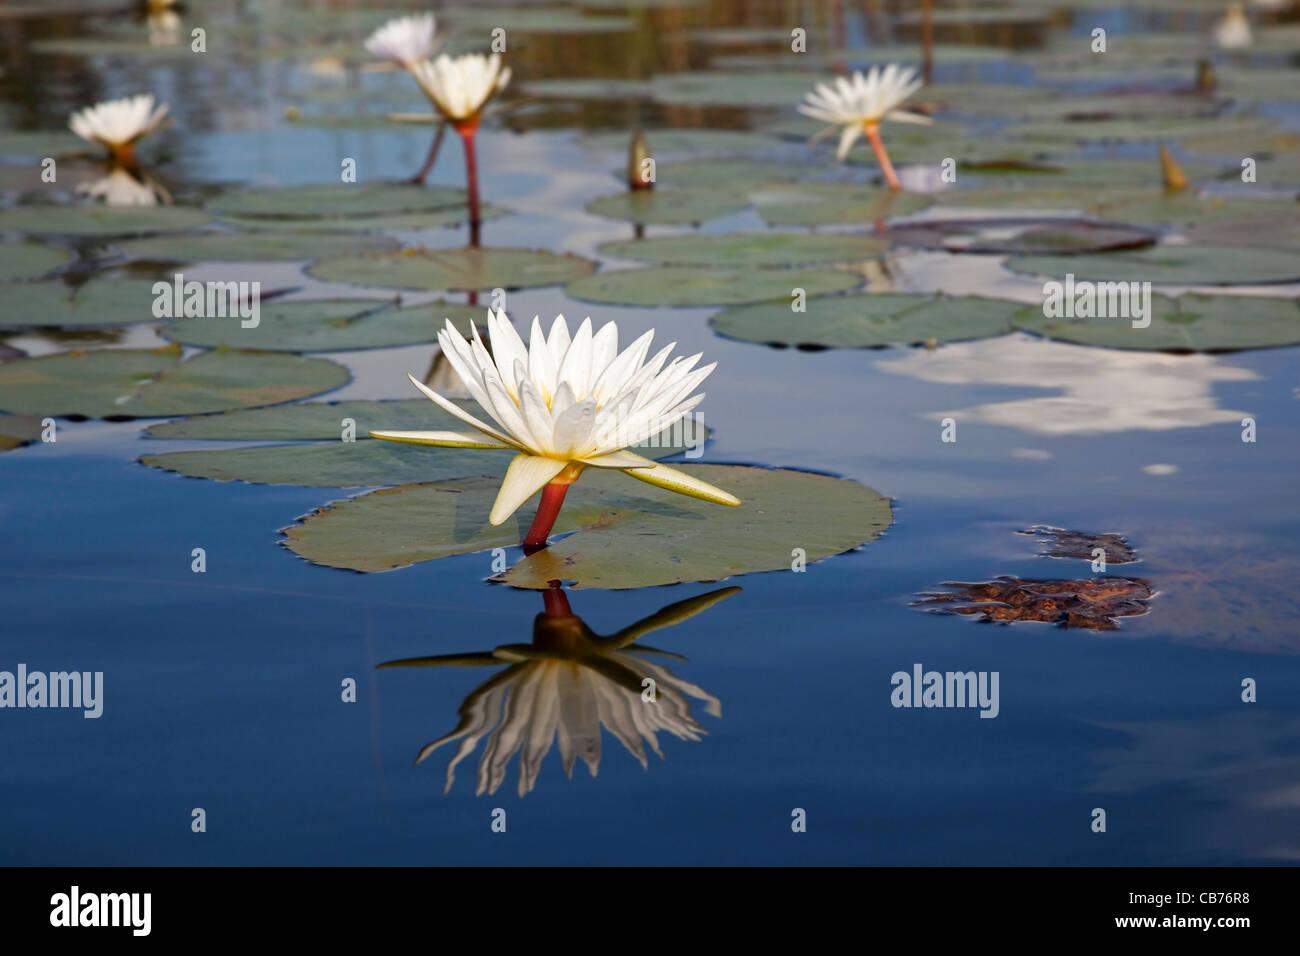 White water lilies on lake in the Okavango Delta, Botswana, Africa - Stock Image